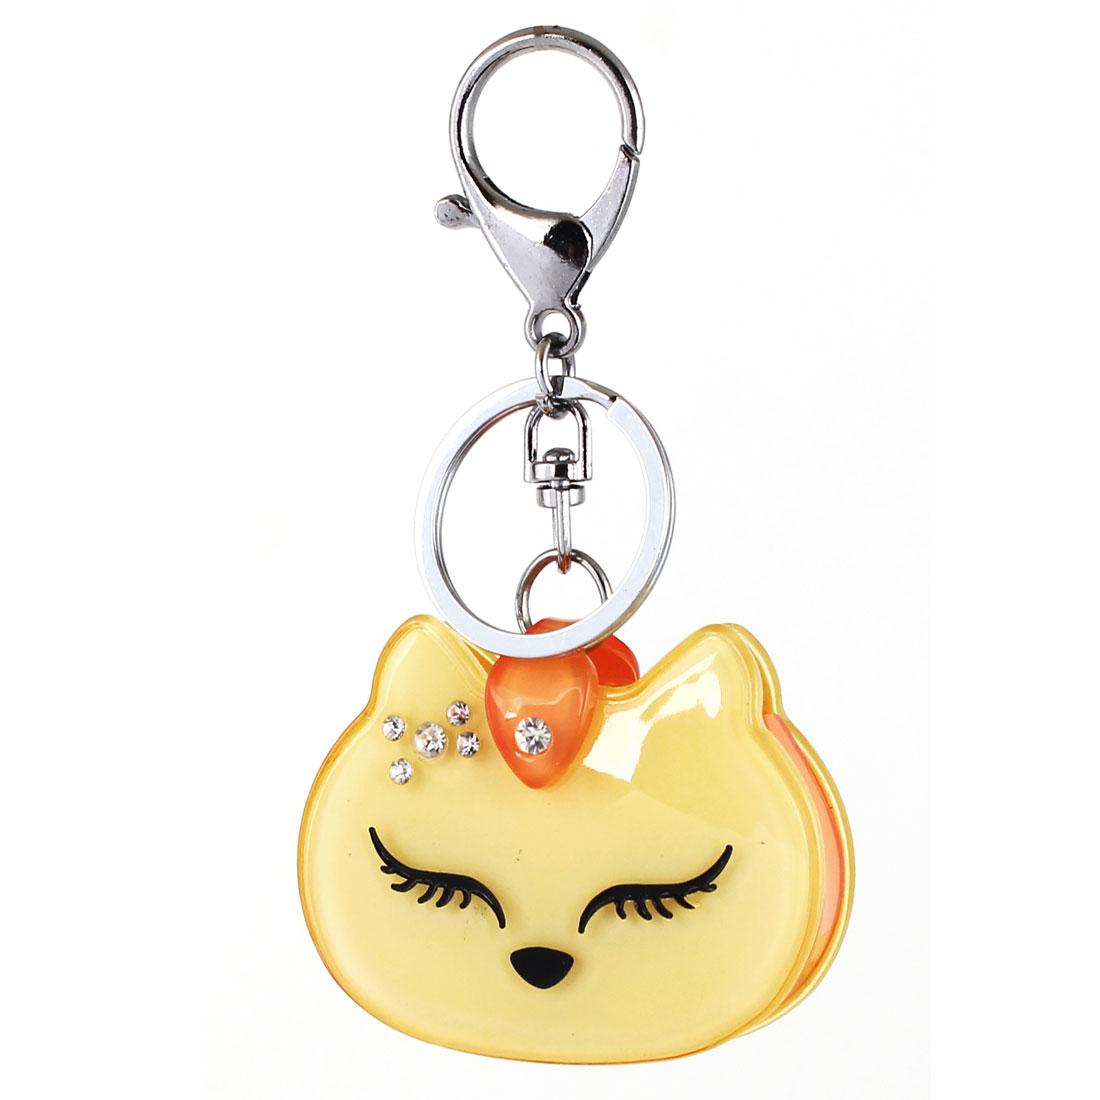 Bag Charm Gift Cartoon Cat Pendant Lobster Clasp Keyring Key Chain Yellow Orange